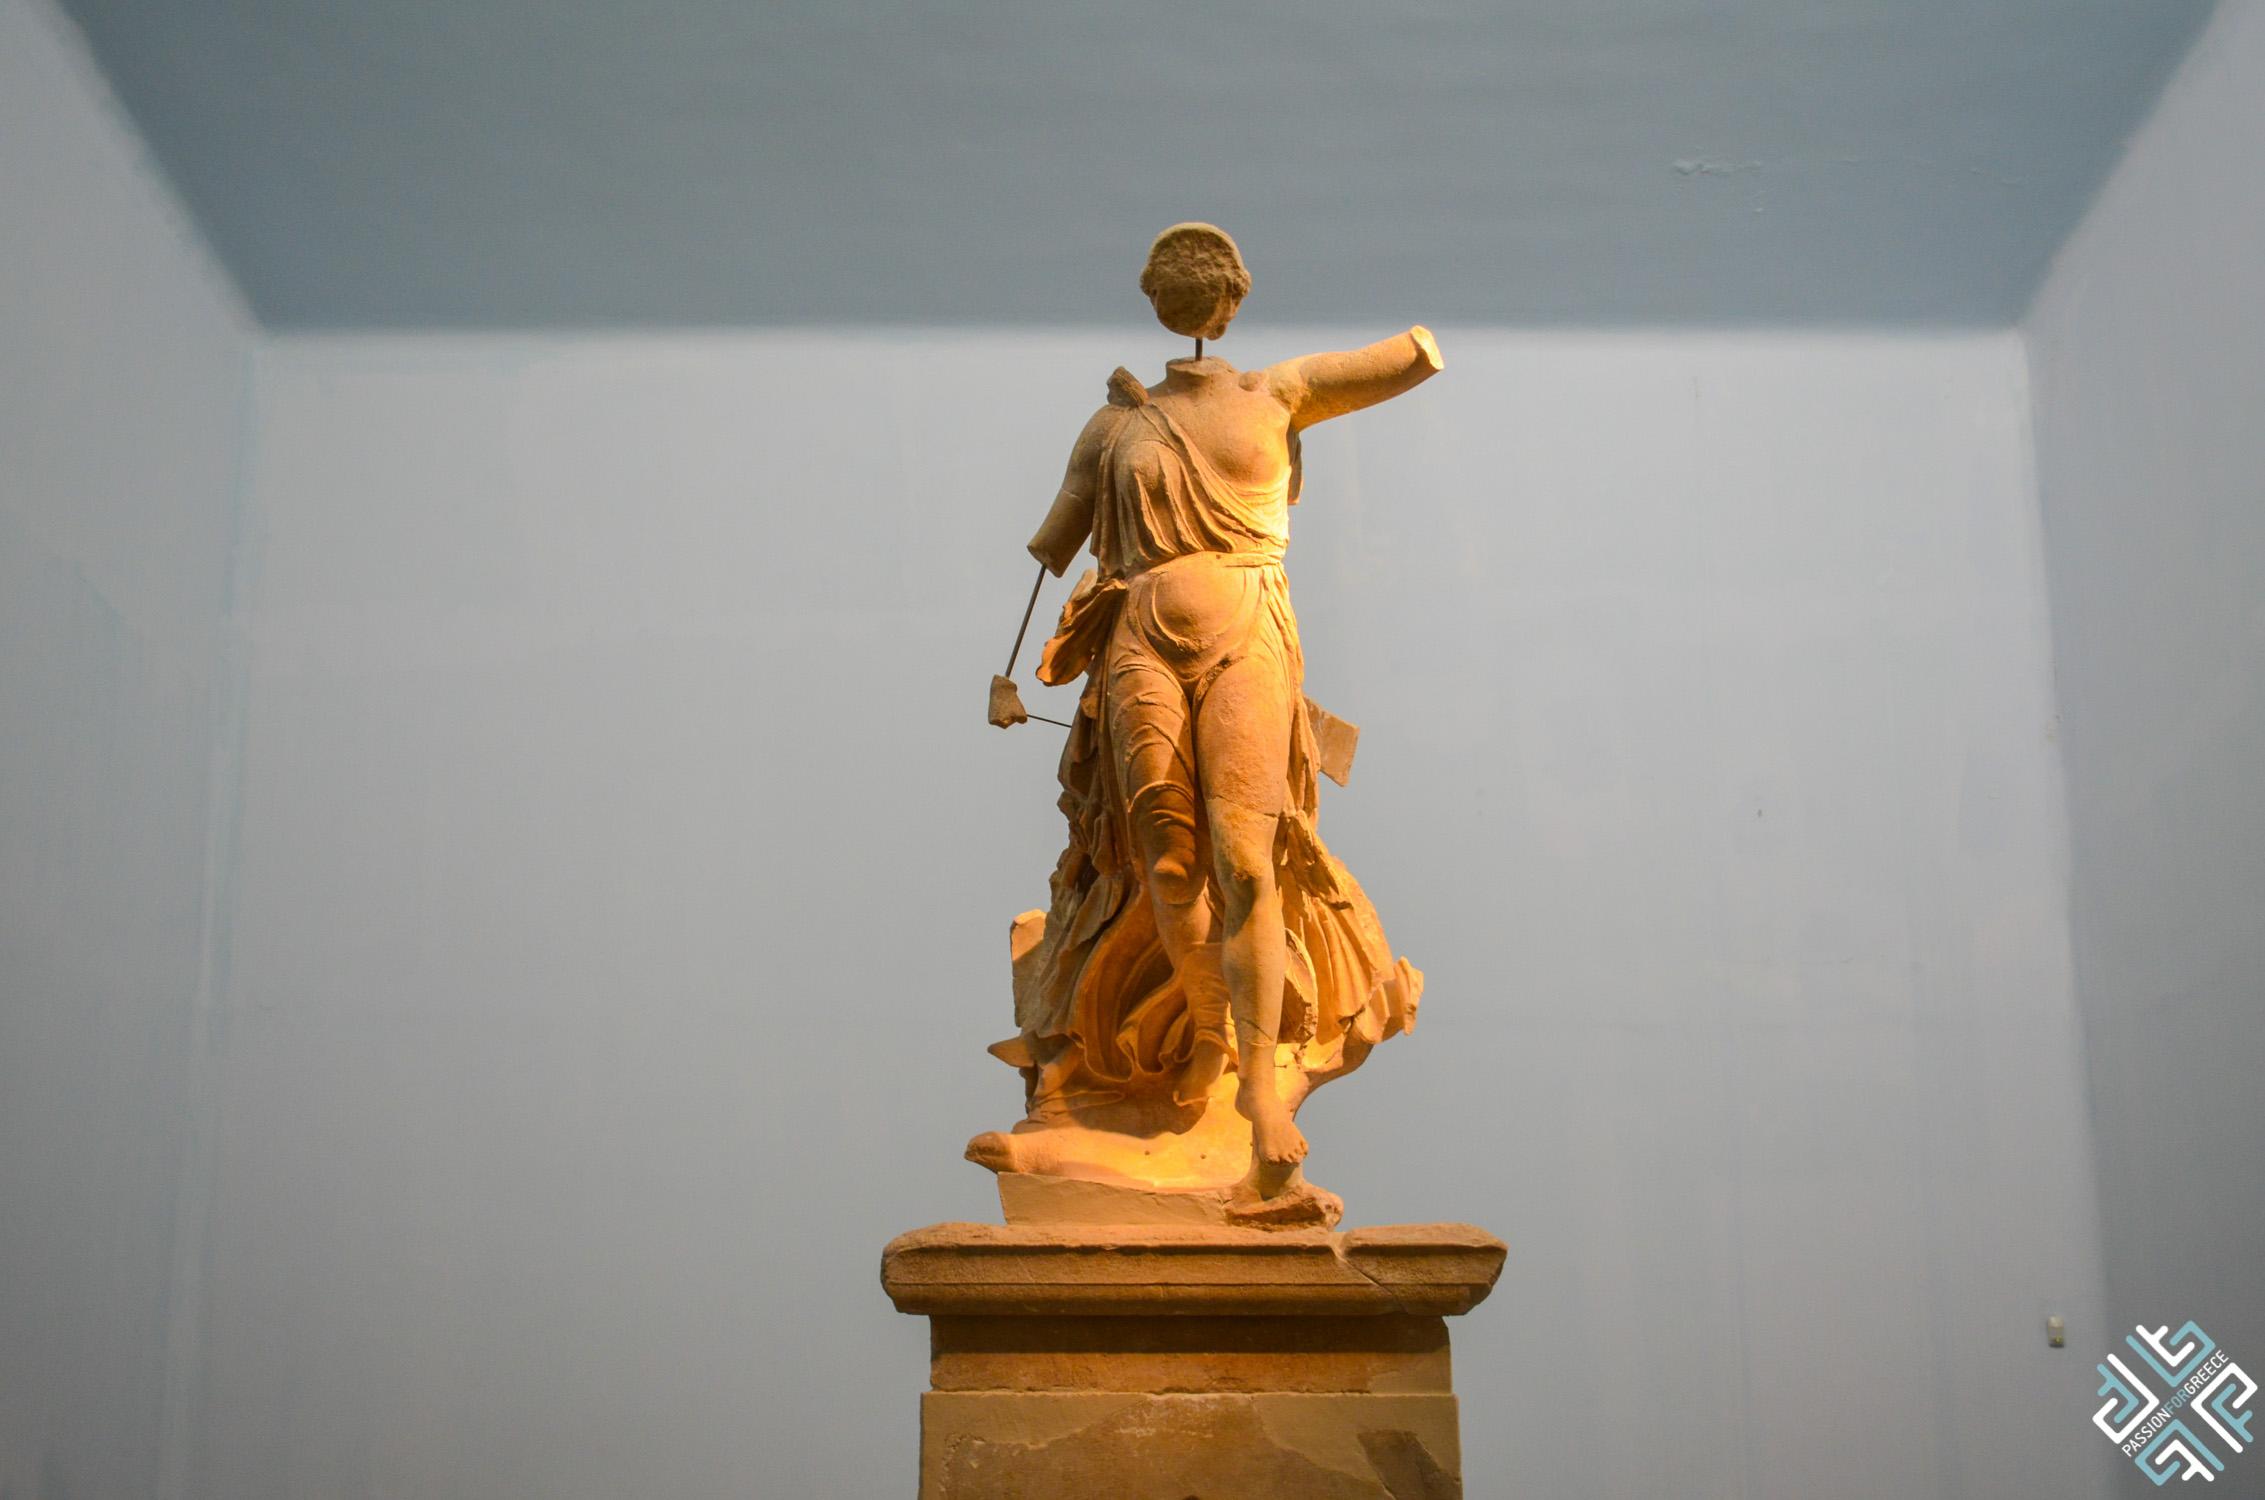 ancient-olympia-greece-museum-greek-gods-1